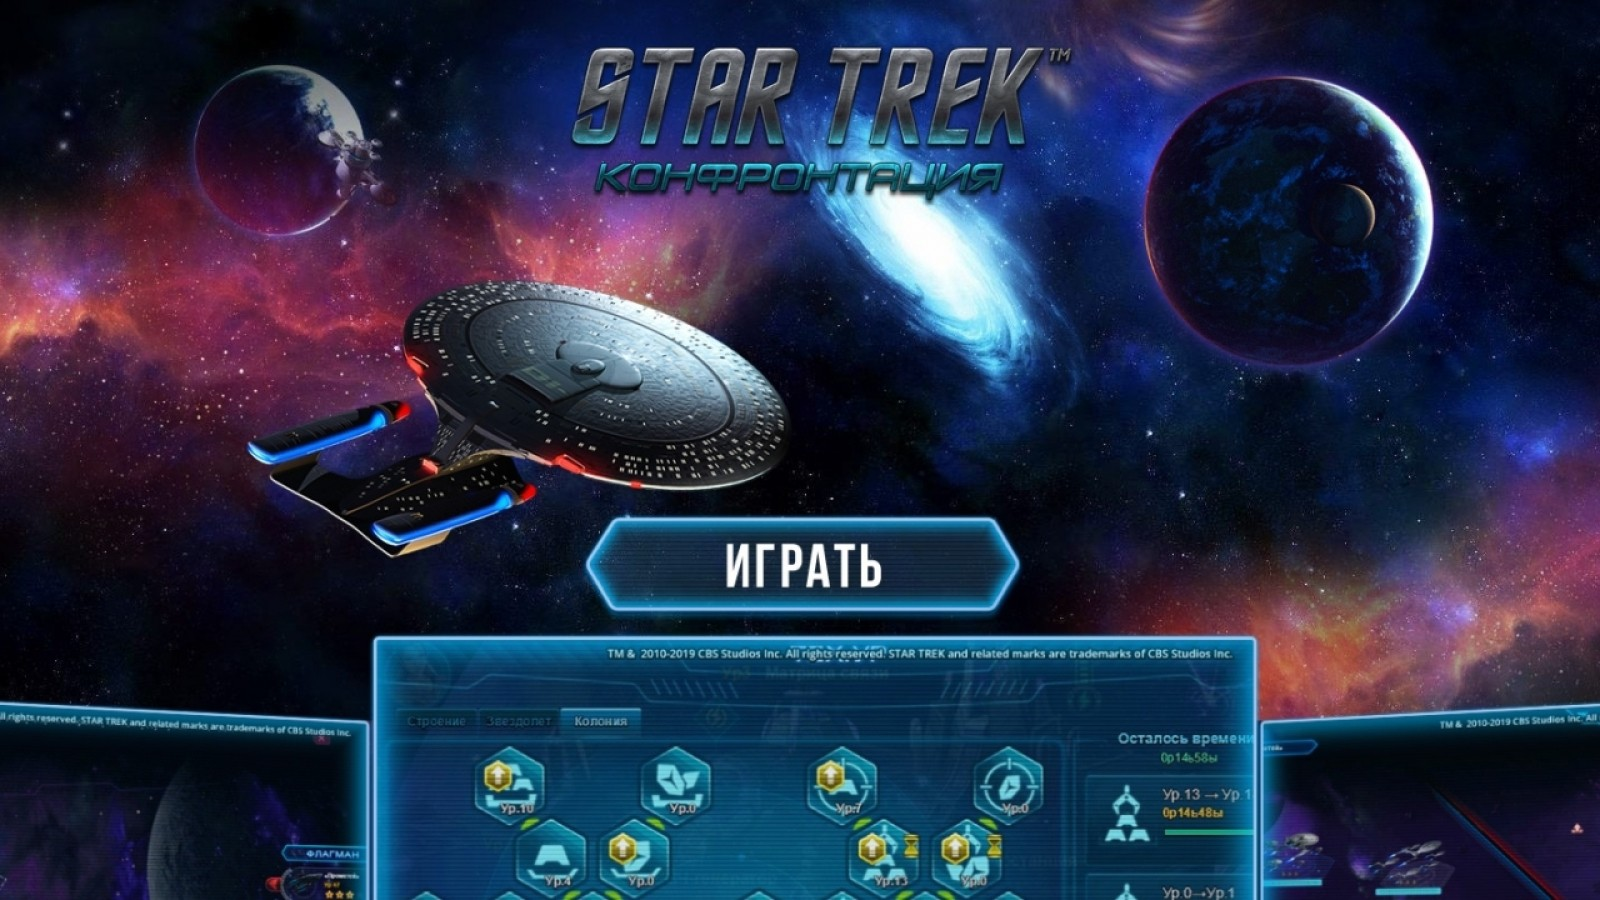 Игра Star Trek онлайн